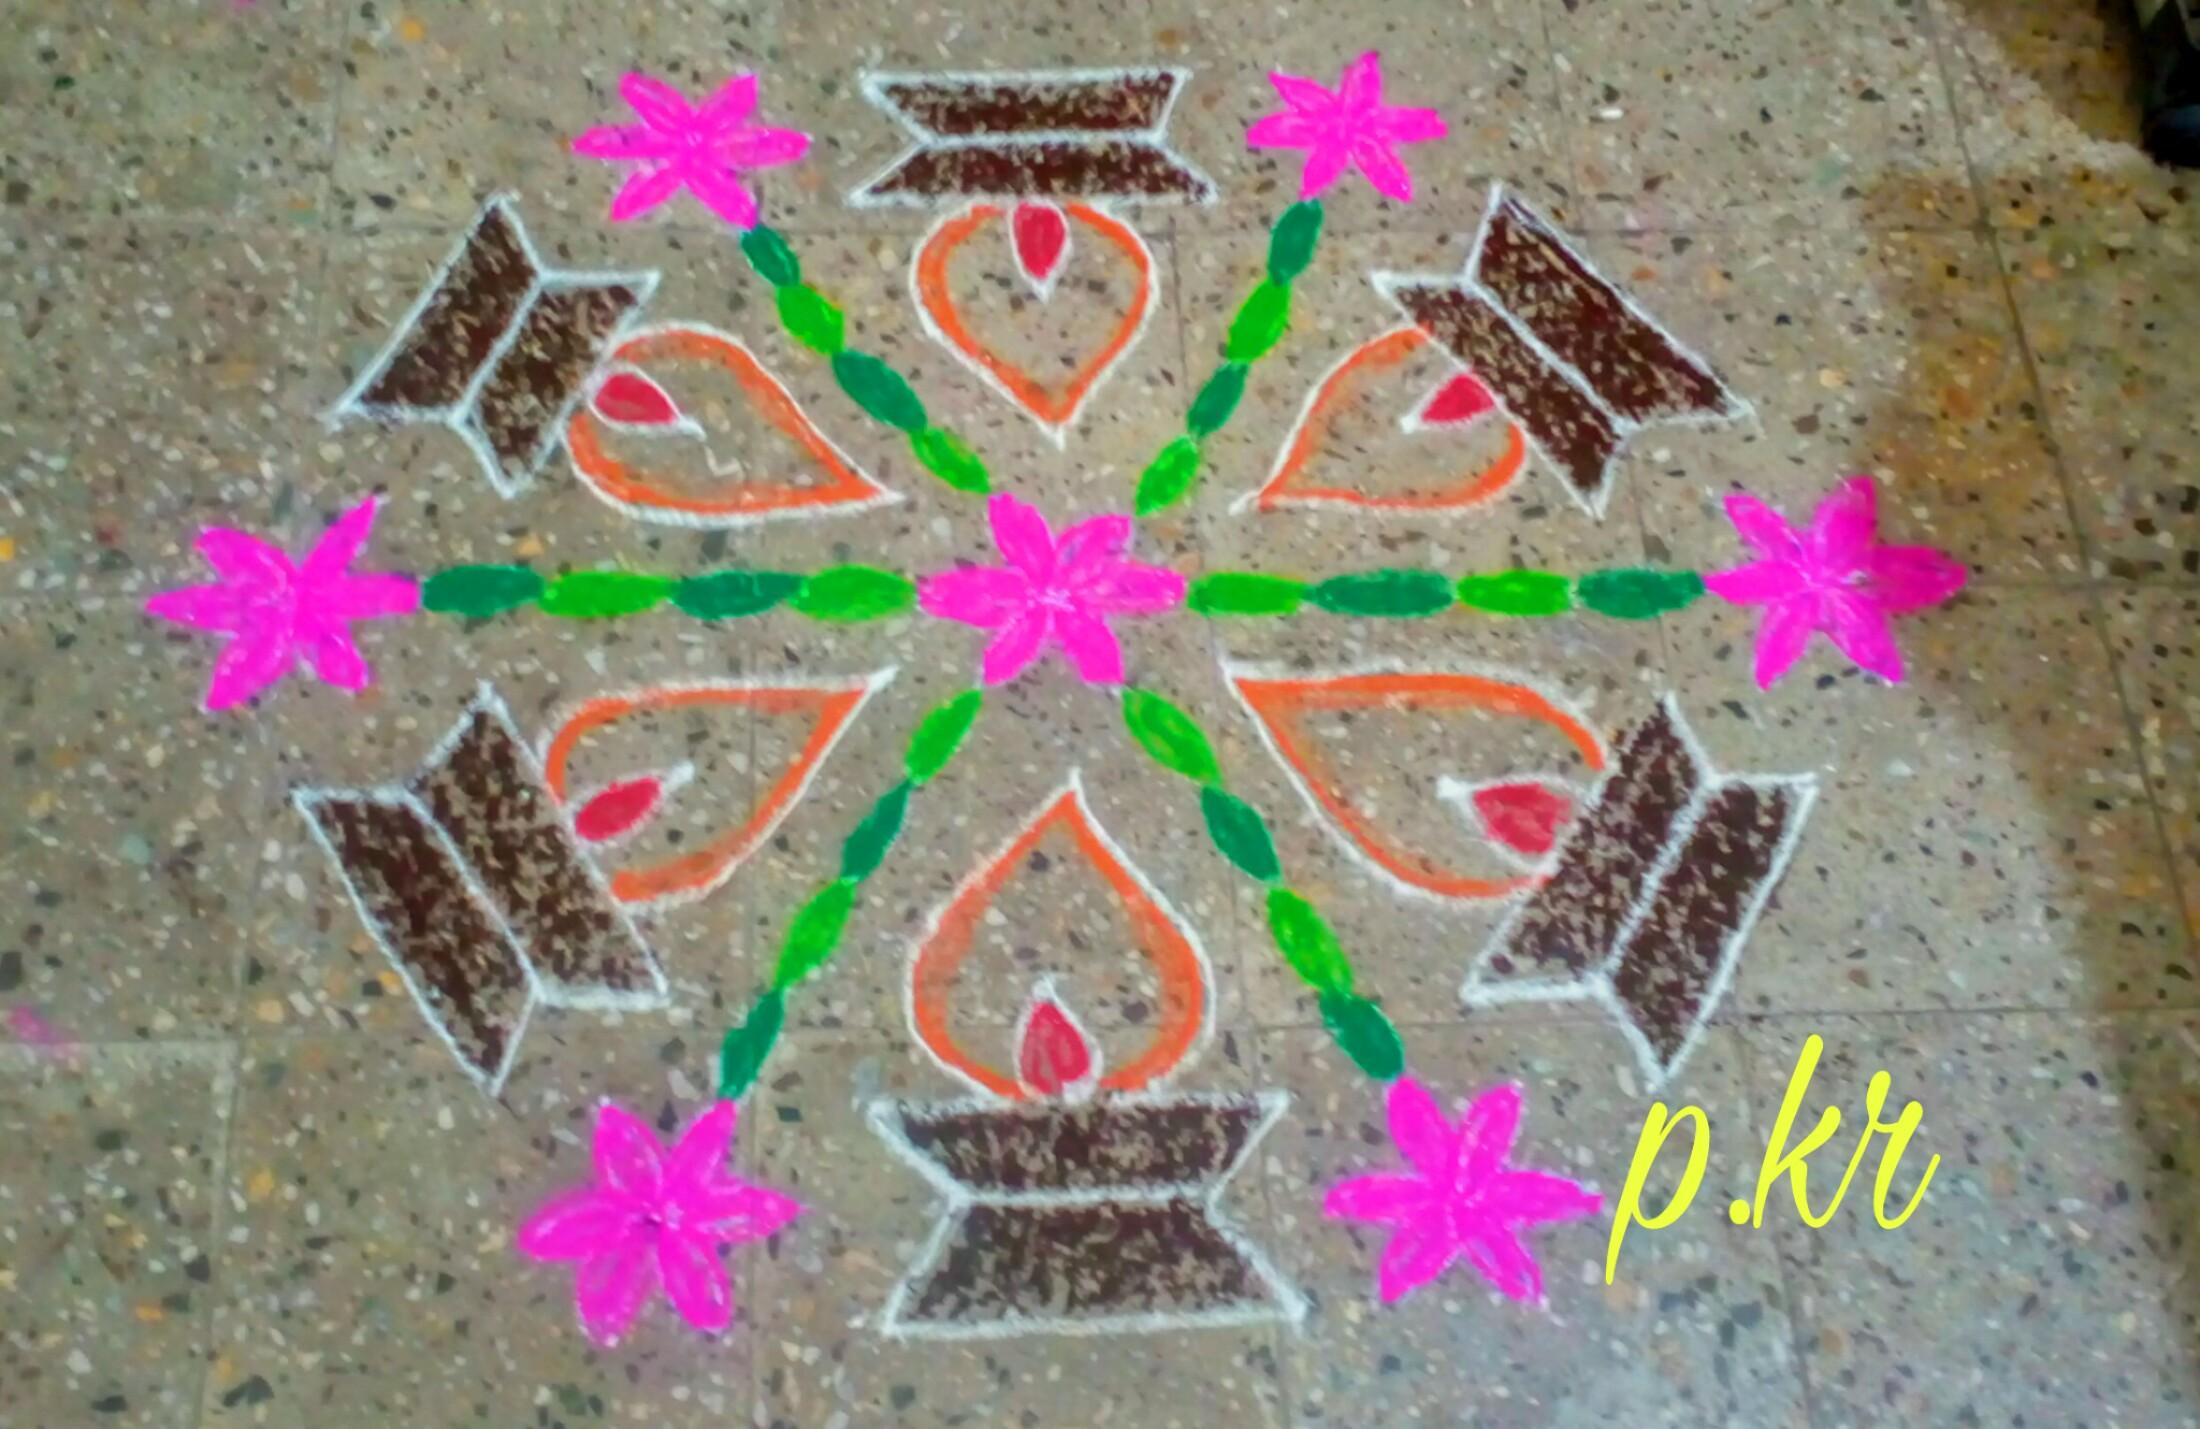 Kolam contest || Diya Rangoli || vilakku kolam